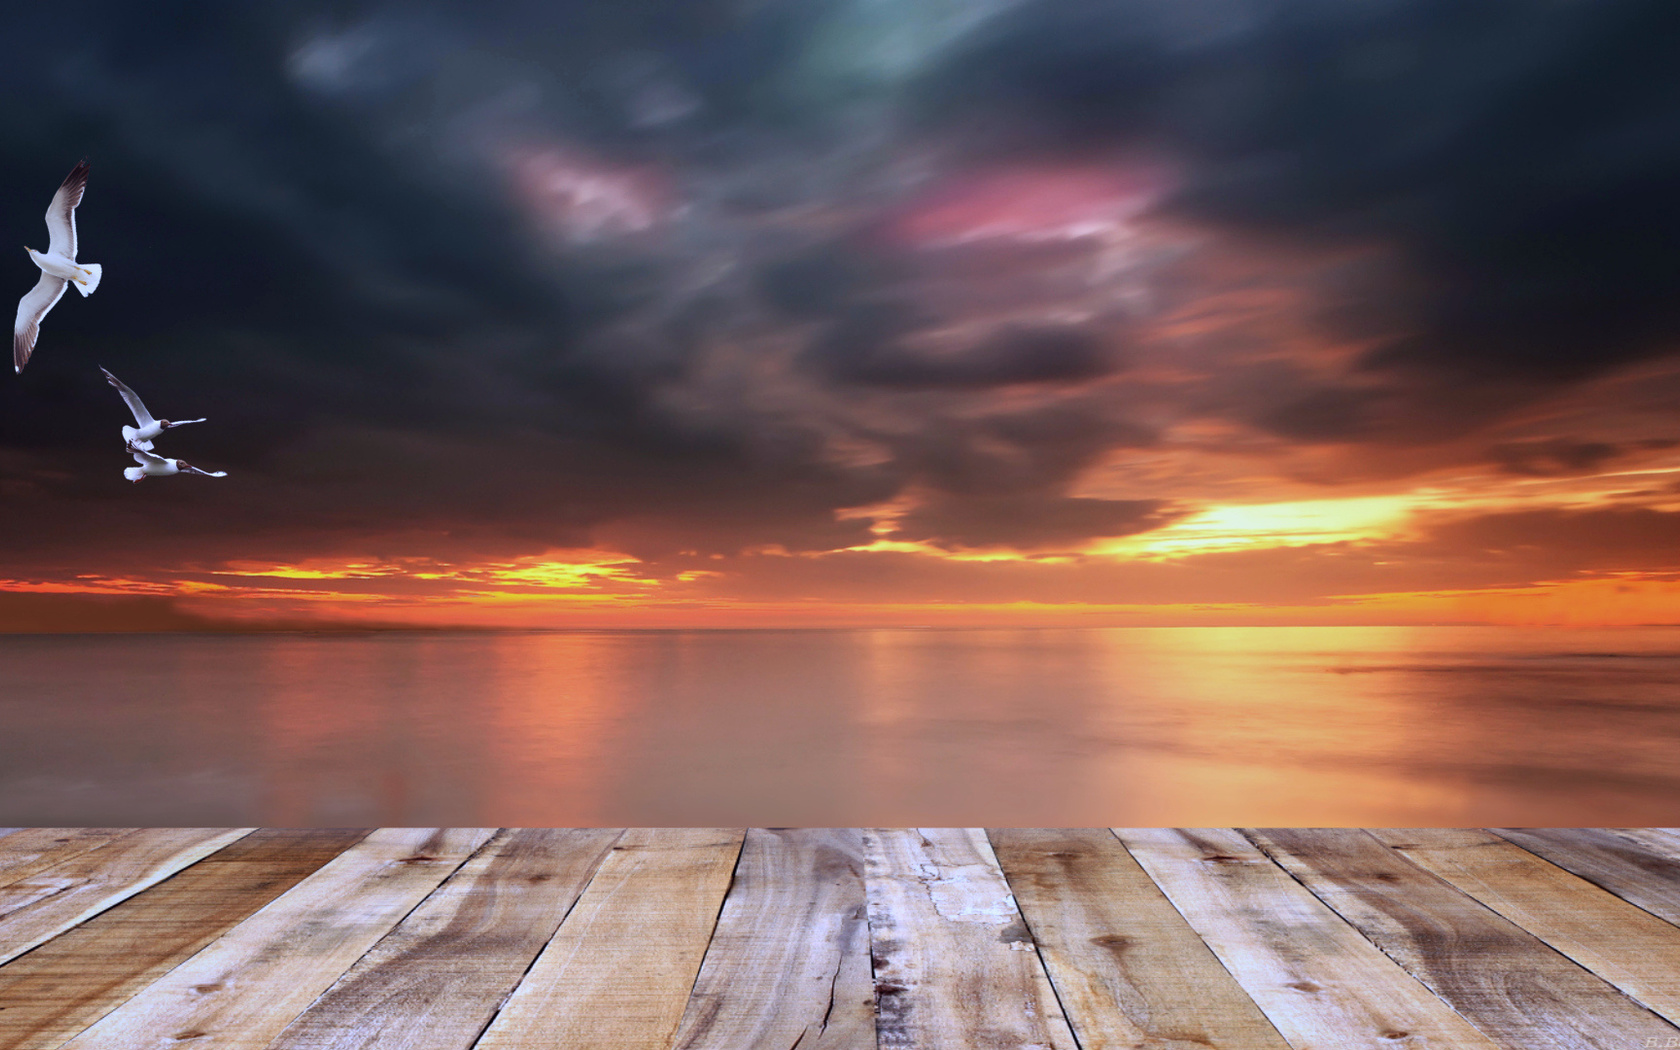 море, вечер, причал